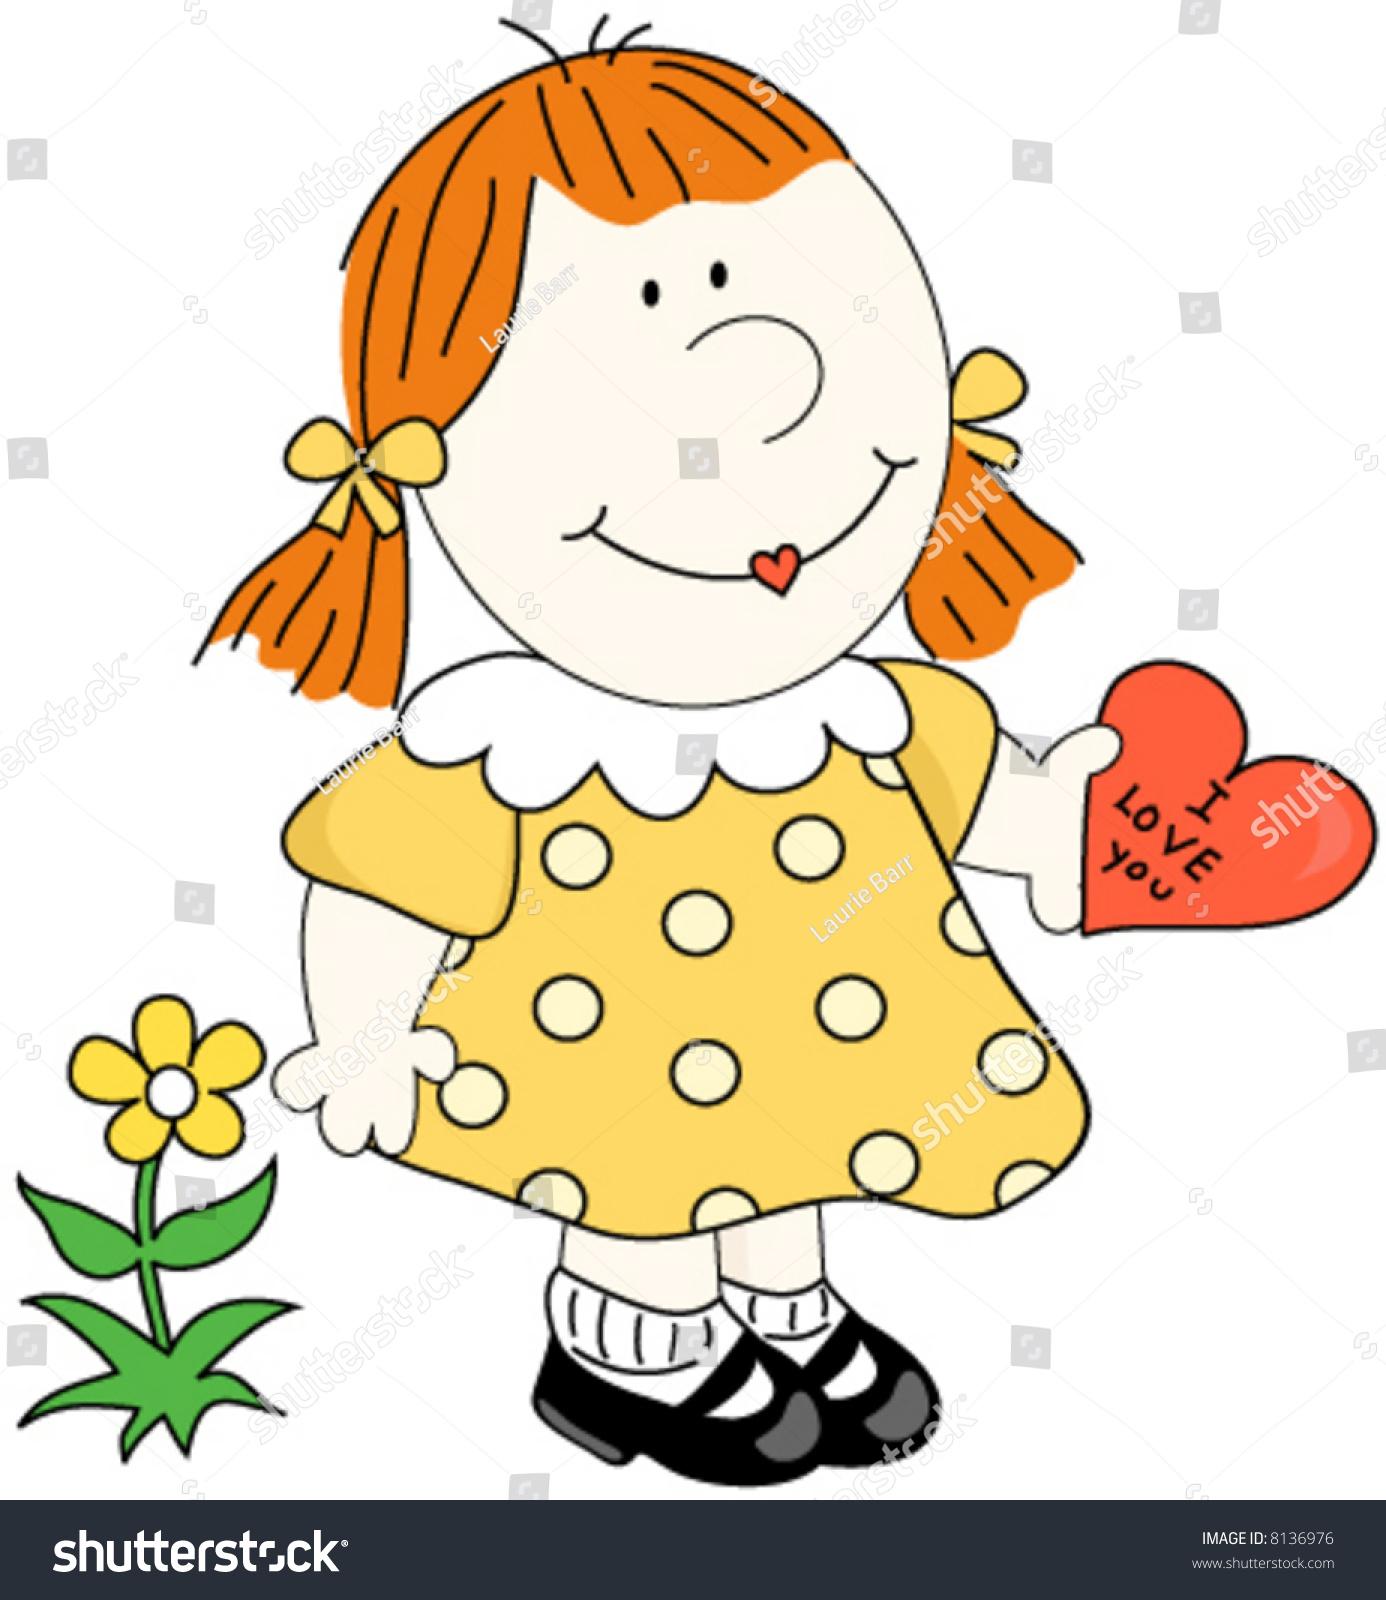 Cartoon girl i love you heart stock vector 8136976 shutterstock cartoon girl with i love you izmirmasajfo